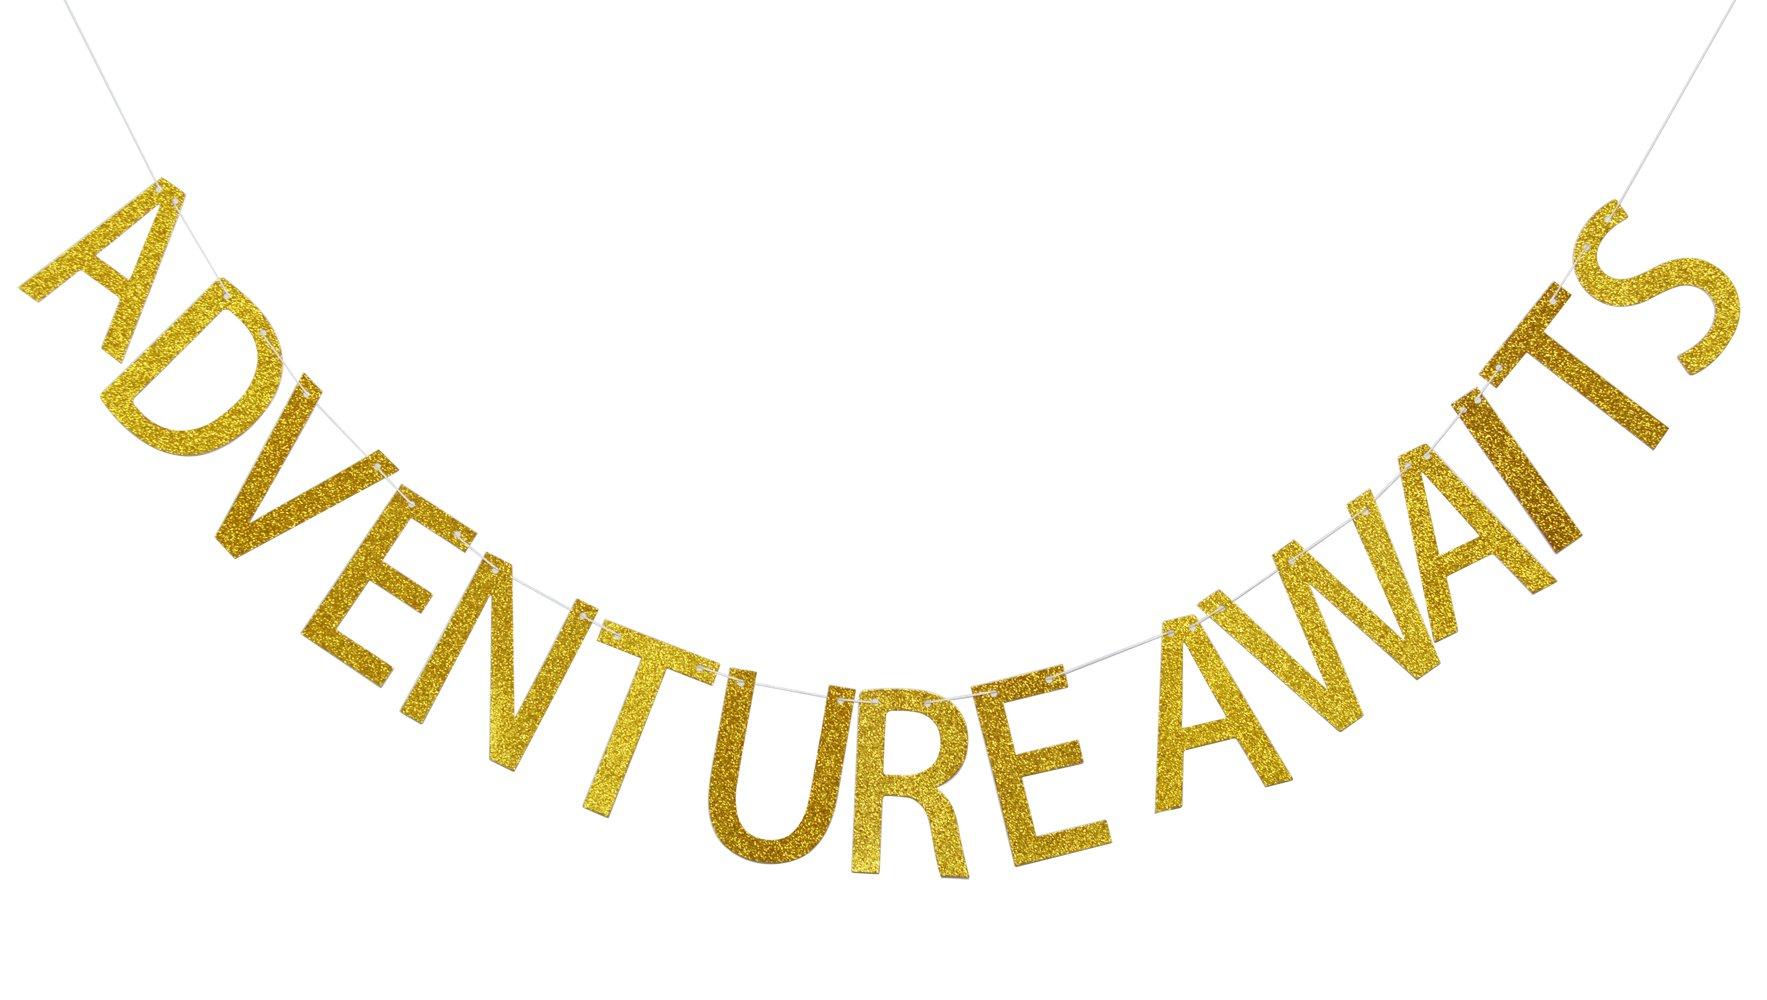 Adventure Awaits Gold Glitter Banner, Baby Shower Banner, Graduation Sign, High School Graduation College Grad Decor (Gold)